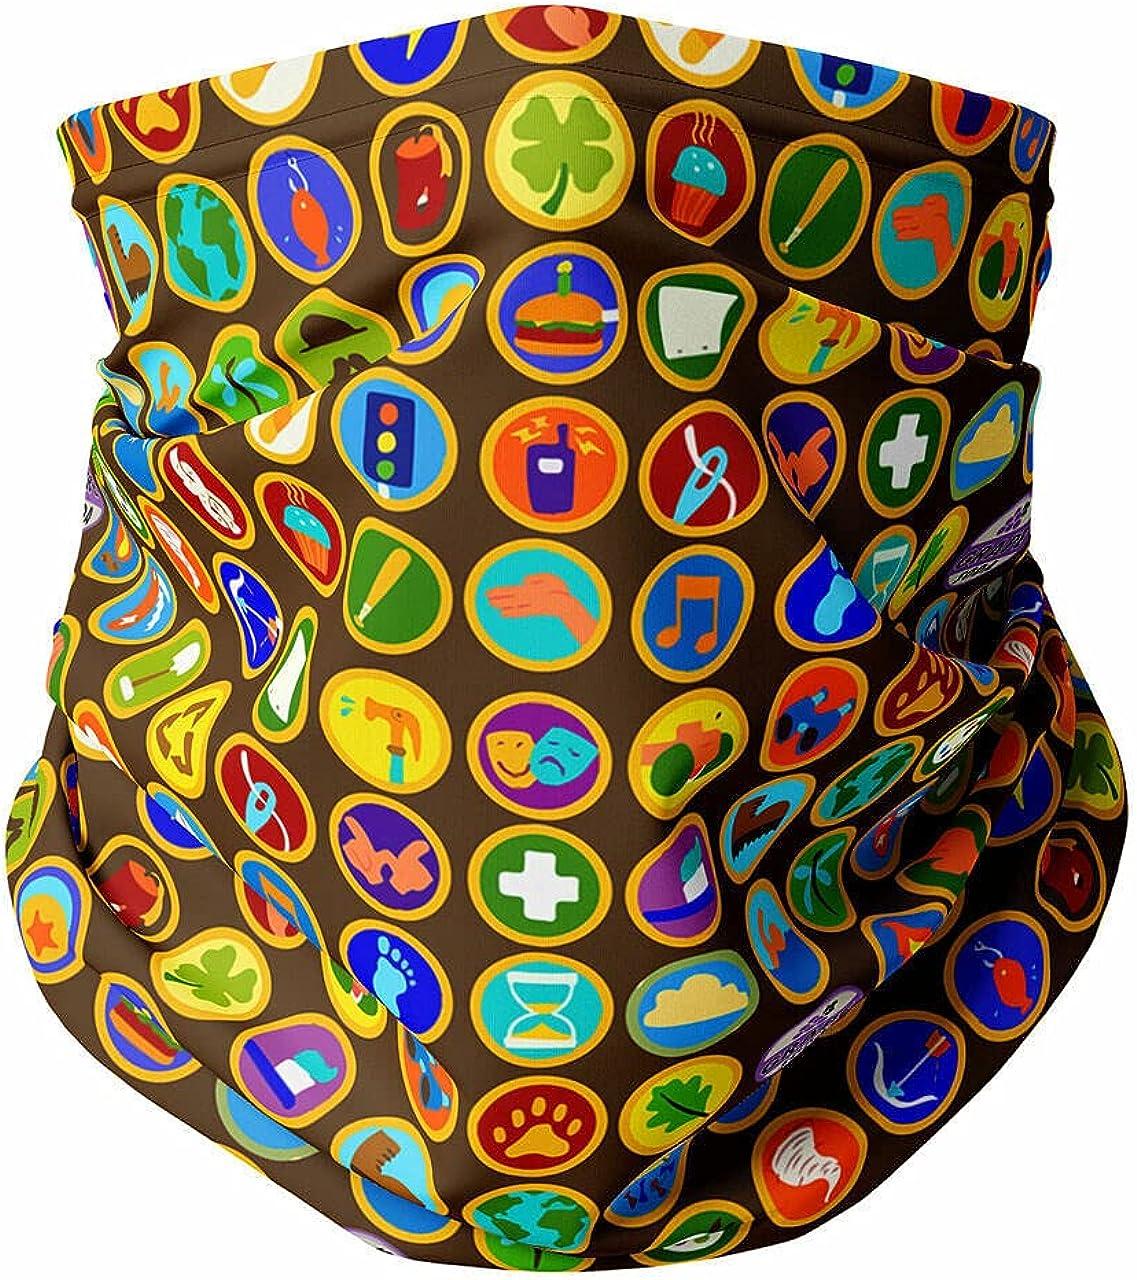 Neck Gaiter Face Covering - Wilderness Explorer Badges Up Inspired